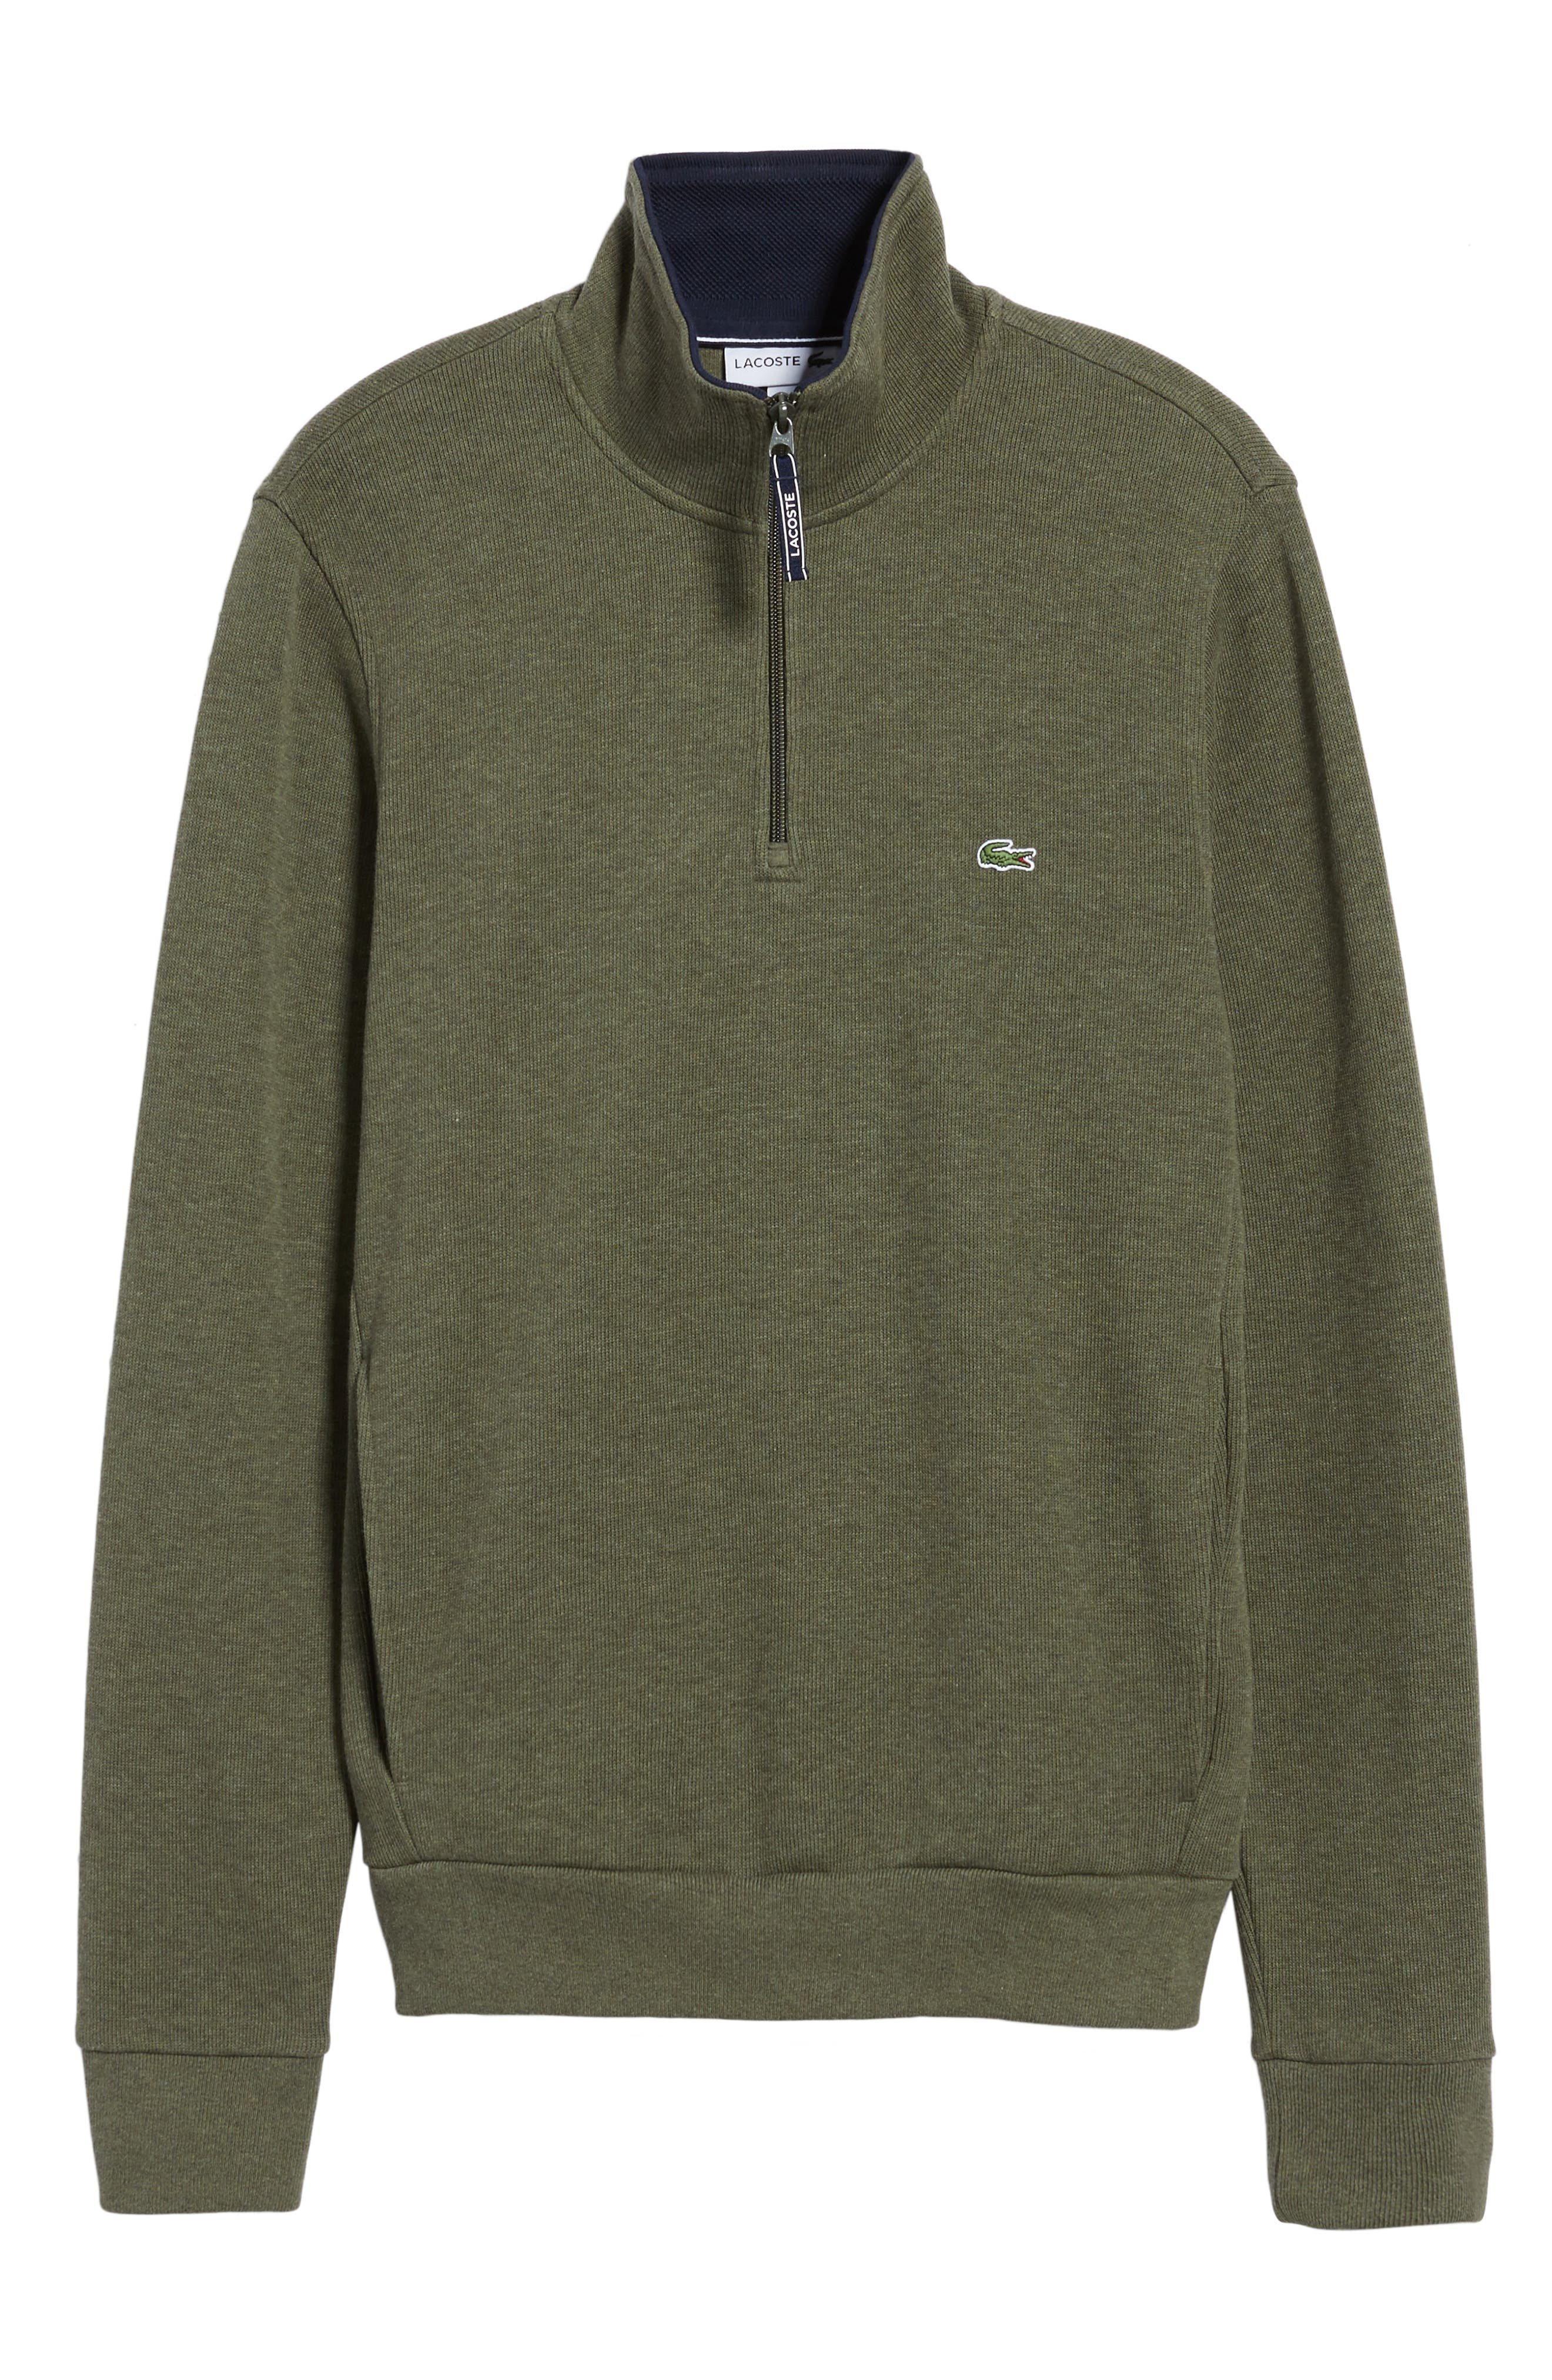 Quarter Zip Sweatshirt,                             Alternate thumbnail 6, color,                             2Qh Army/ Navy Blue